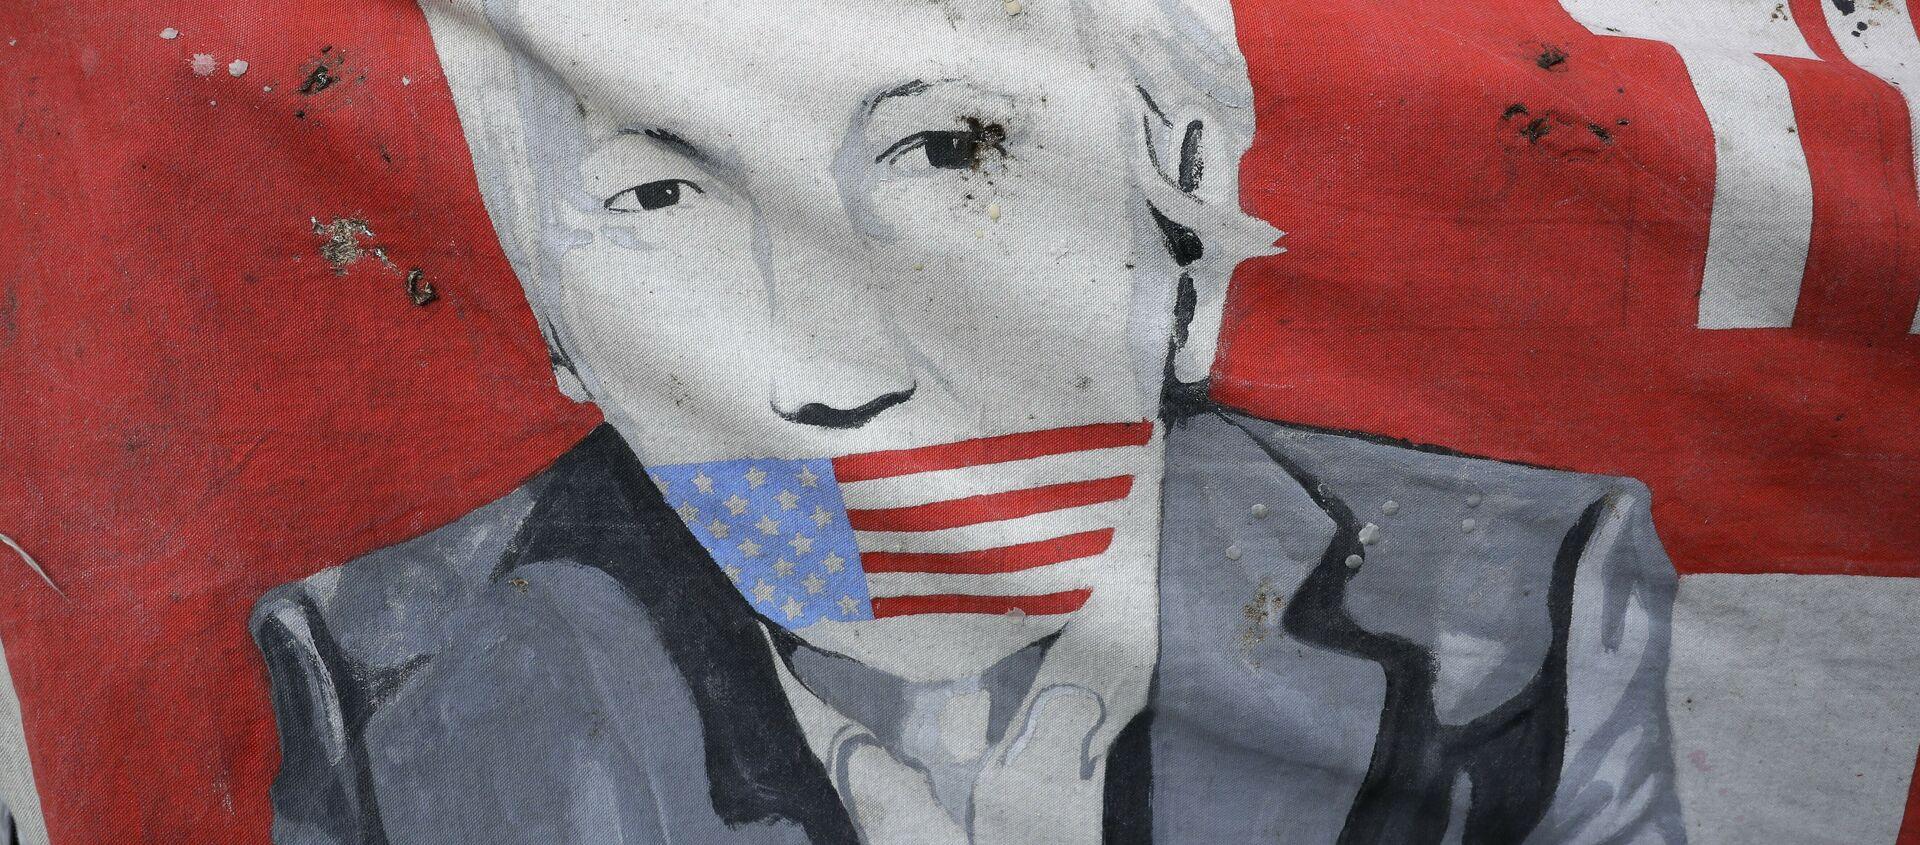 Постер Џулијена Асанжа испред амбасаде Еквадора у Лондону. - Sputnik Србија, 1920, 10.01.2021